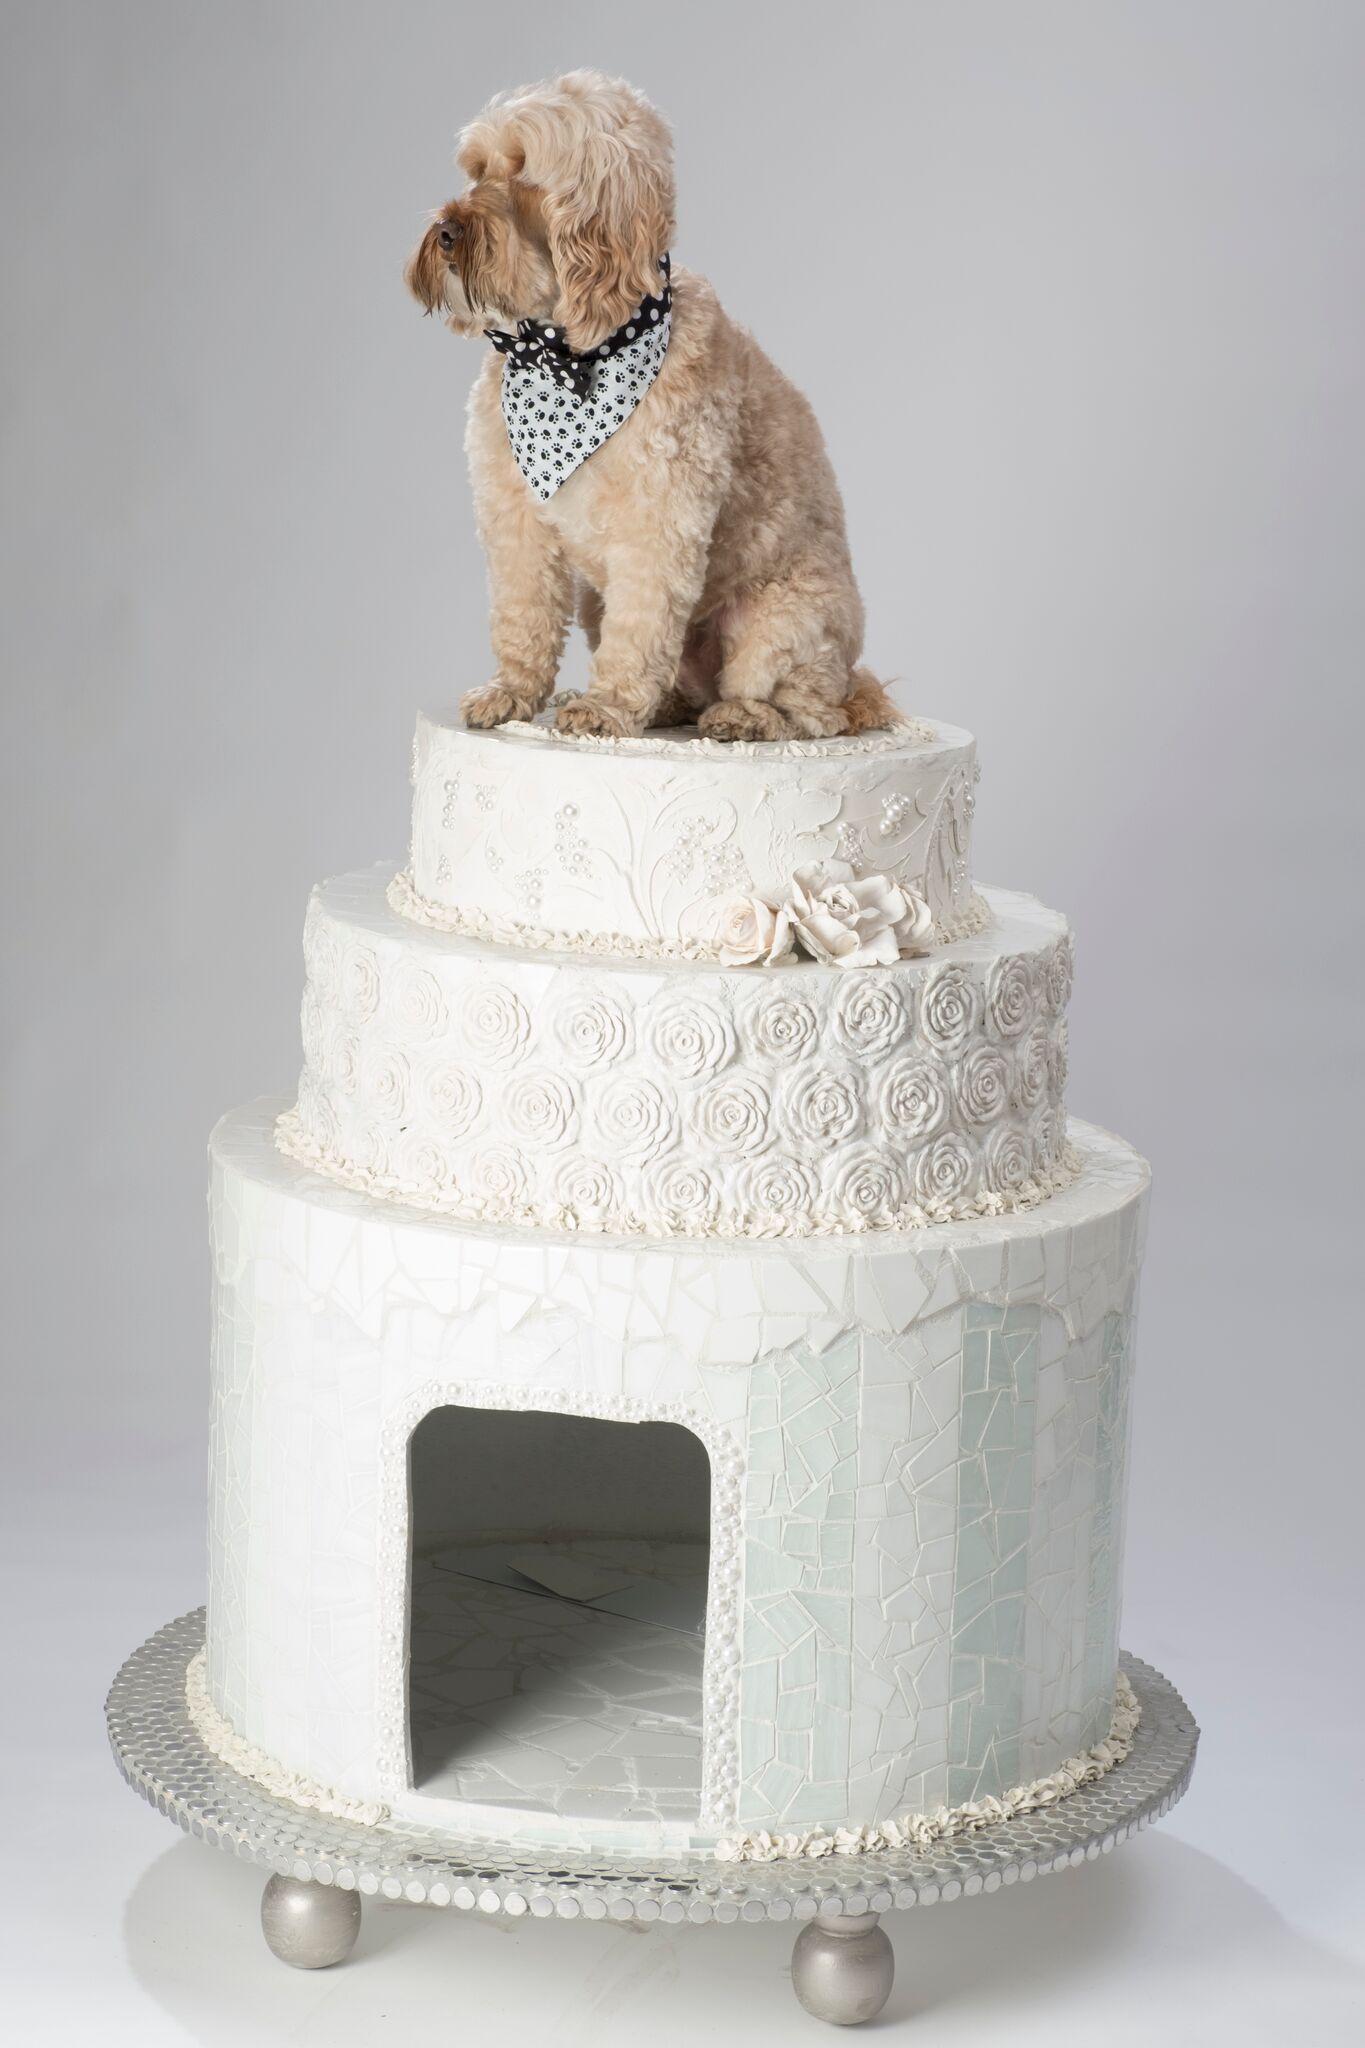 Lot 20 - Jeff Monsein - The Royal Wedding Cake House